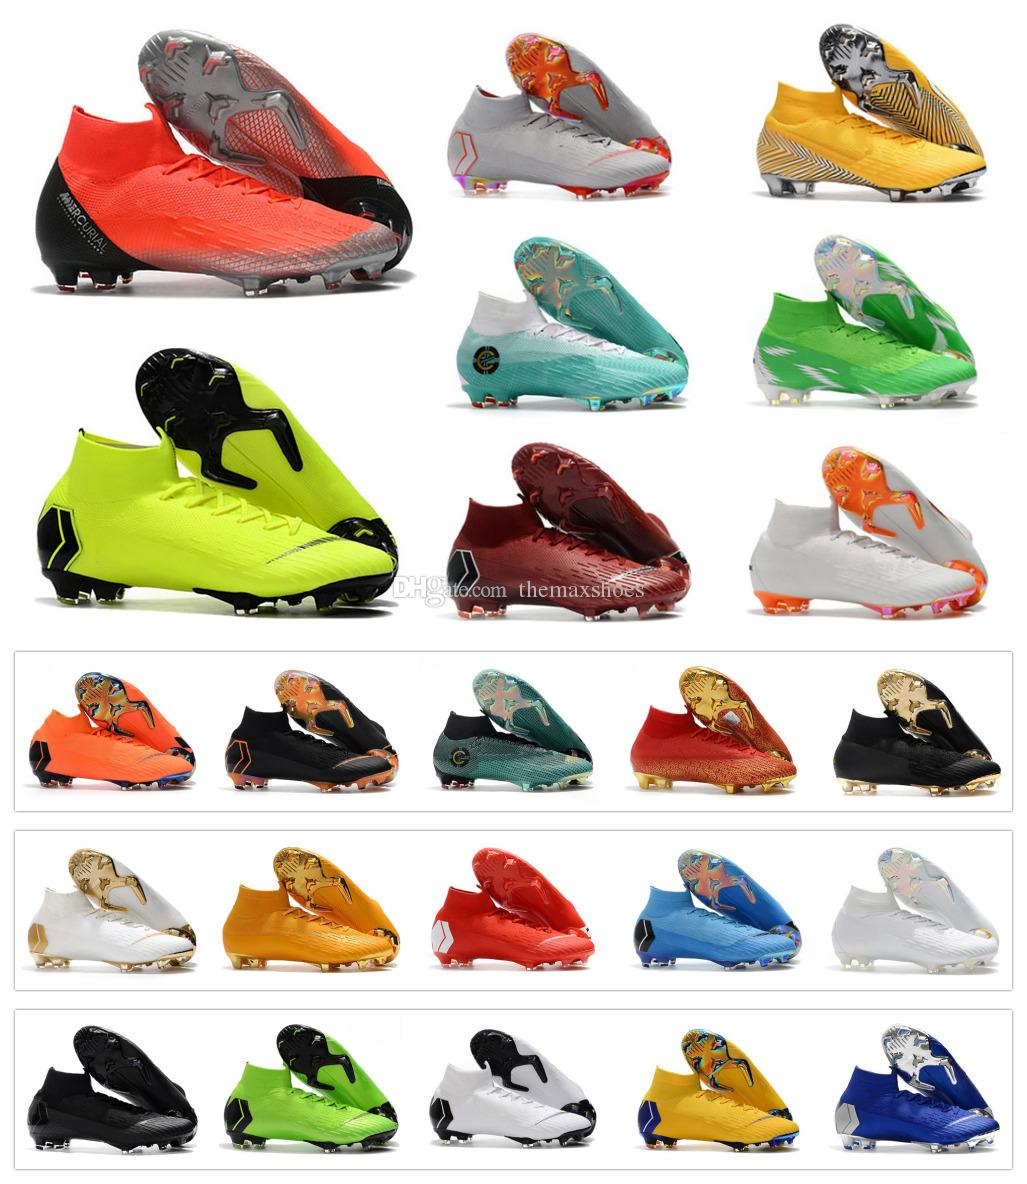 4dd3fa01a Mercurial Superfly VI 360 Elite FG KJ 6 XII 12 CR7 Ronaldo Neymar Mens  Women Boys High Soccer Shoes 20th Football Boots Cleats Size 35 45 Canada  2019 From ...